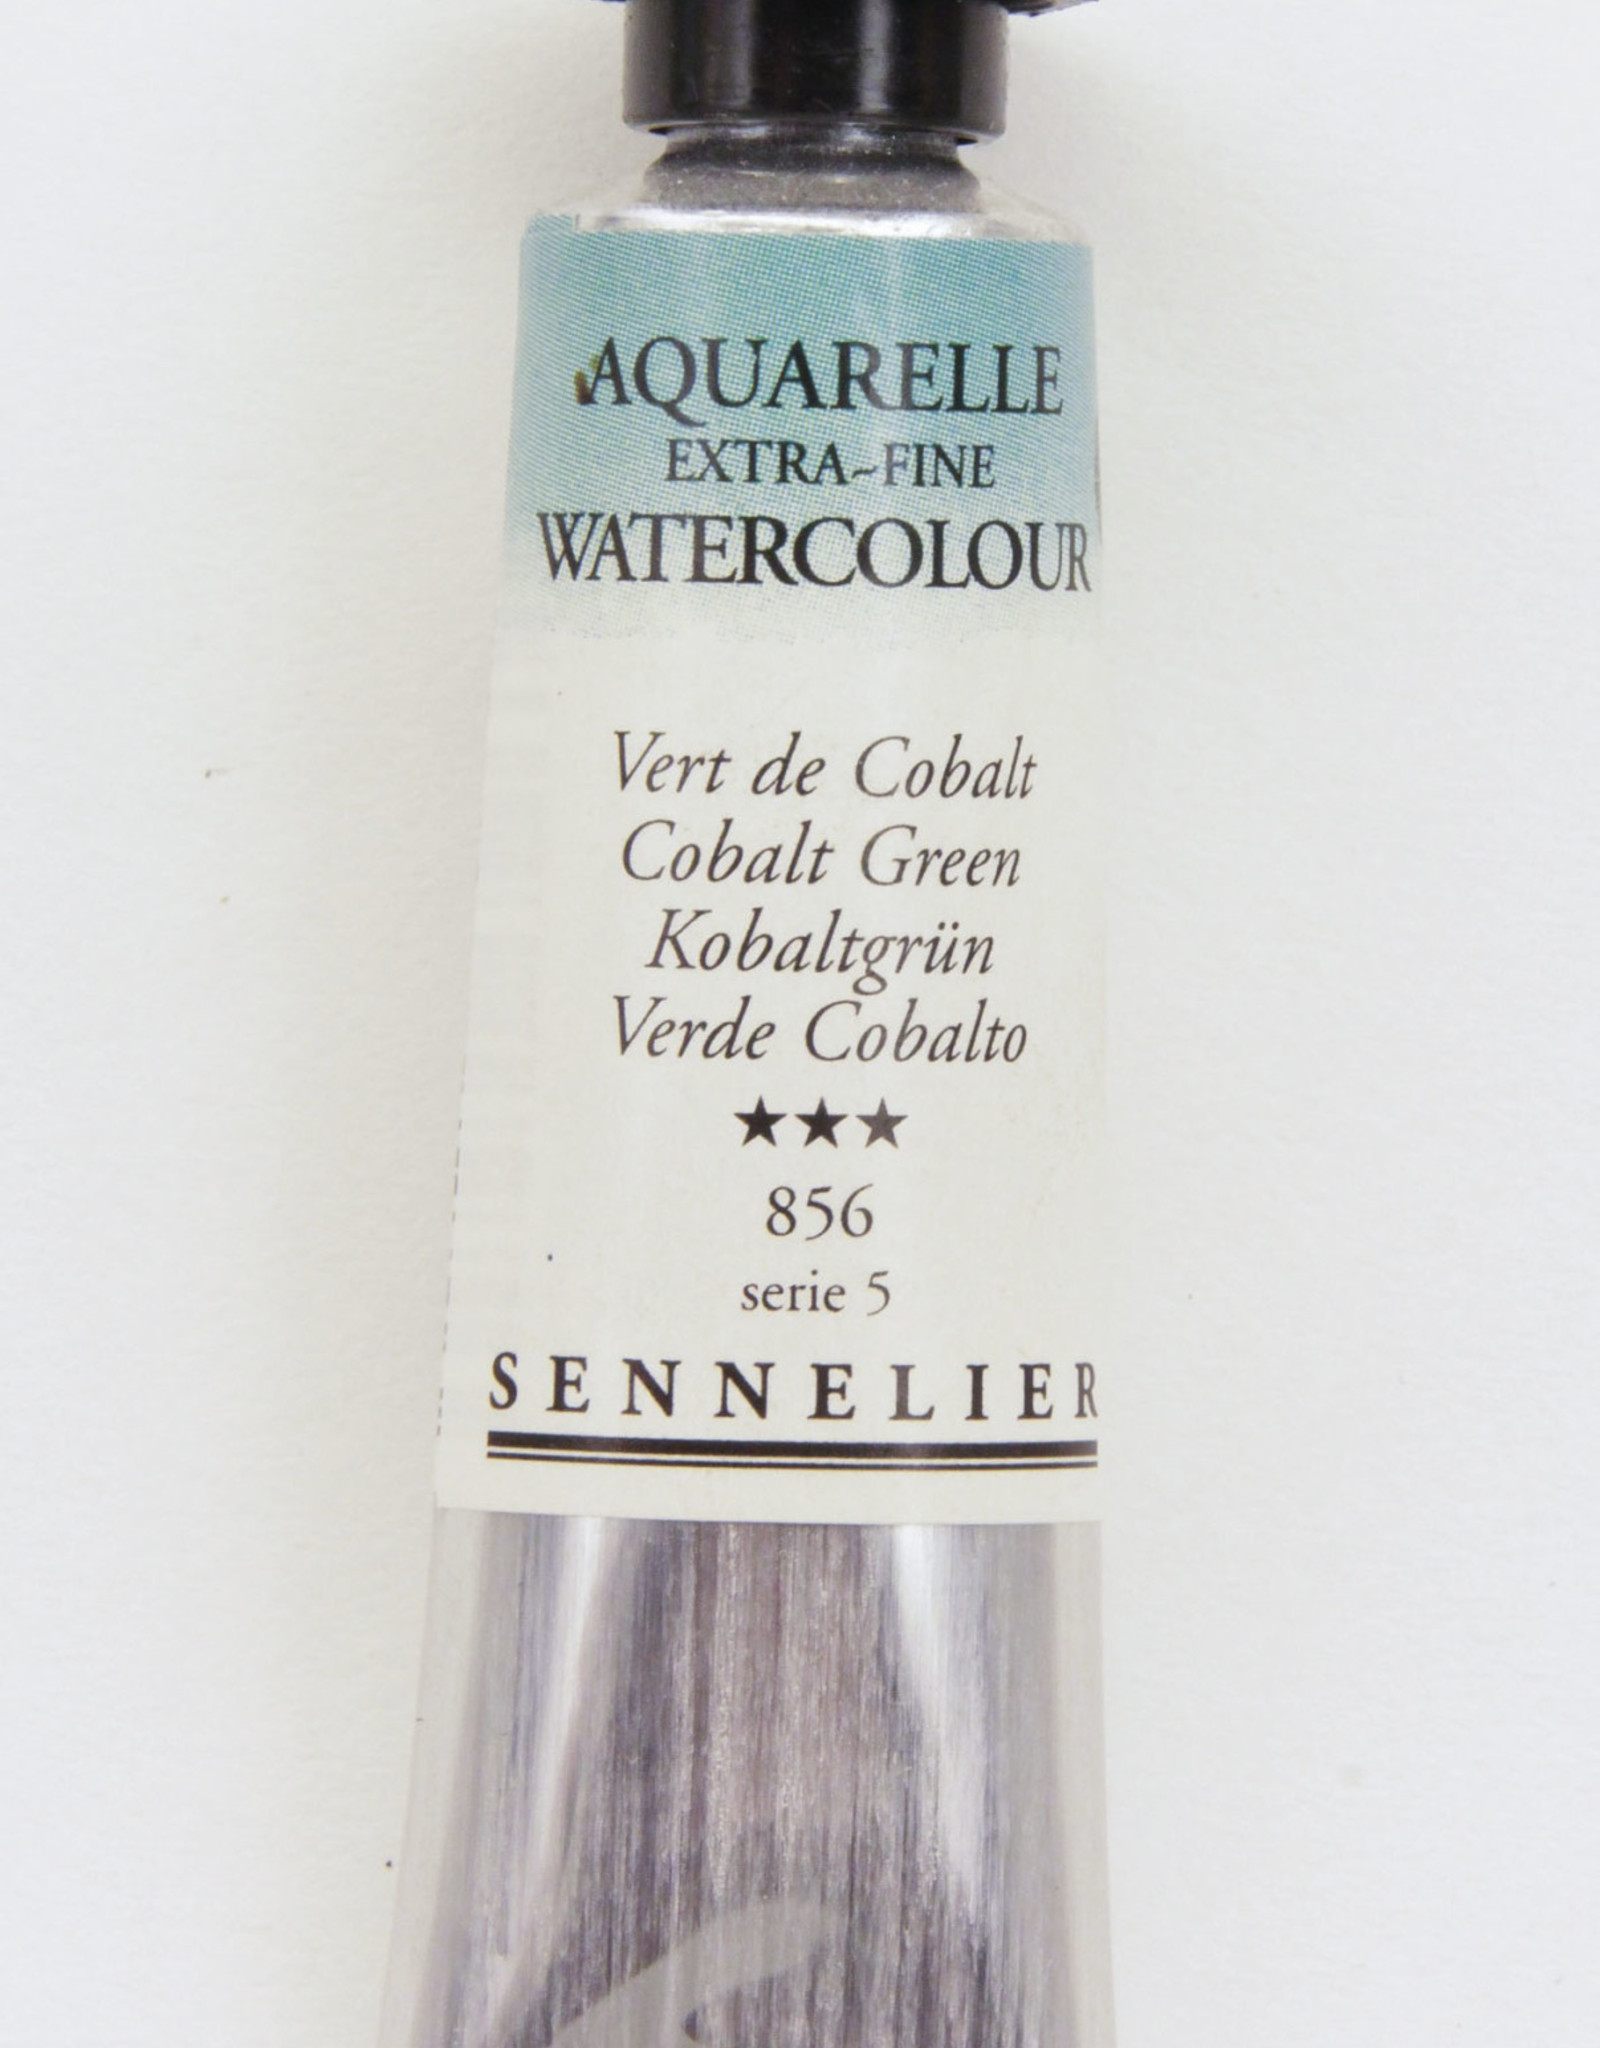 Sennelier, Aquarelle Watercolor Paint, Cobalt Green, 856, 10ml Tube, Series 5